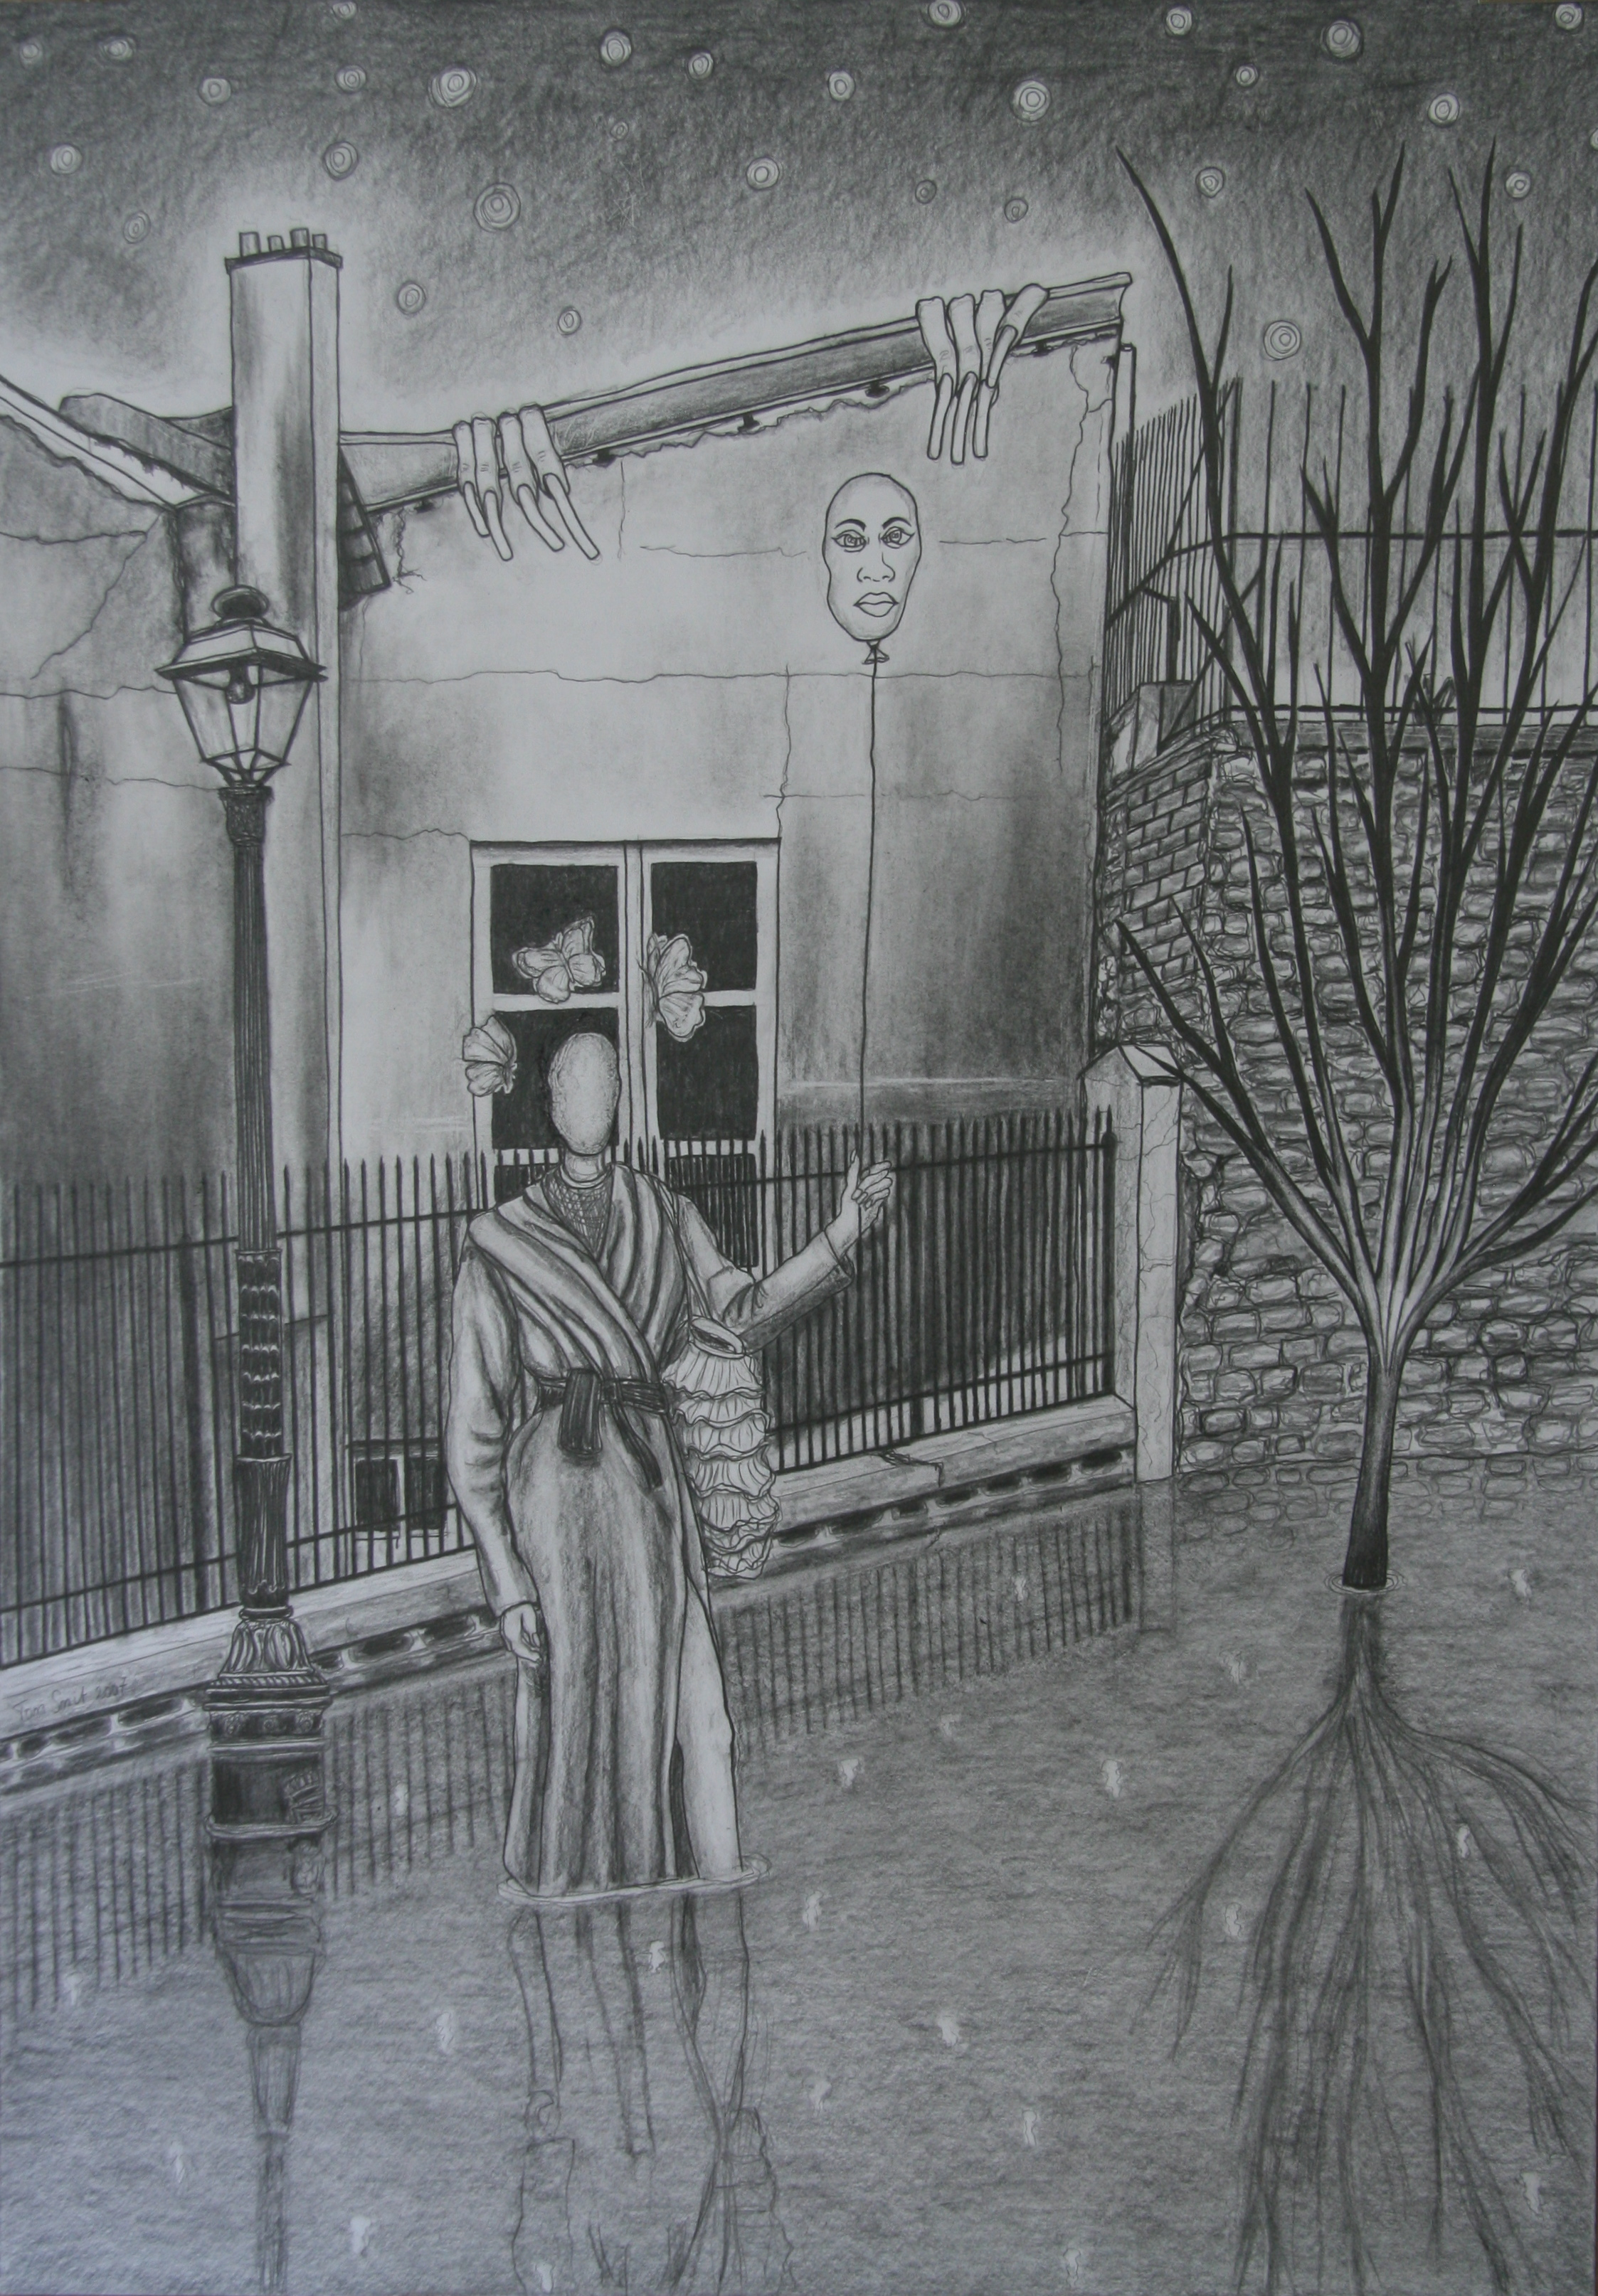 Dag Nacht, 100x70cm, pencil on paper